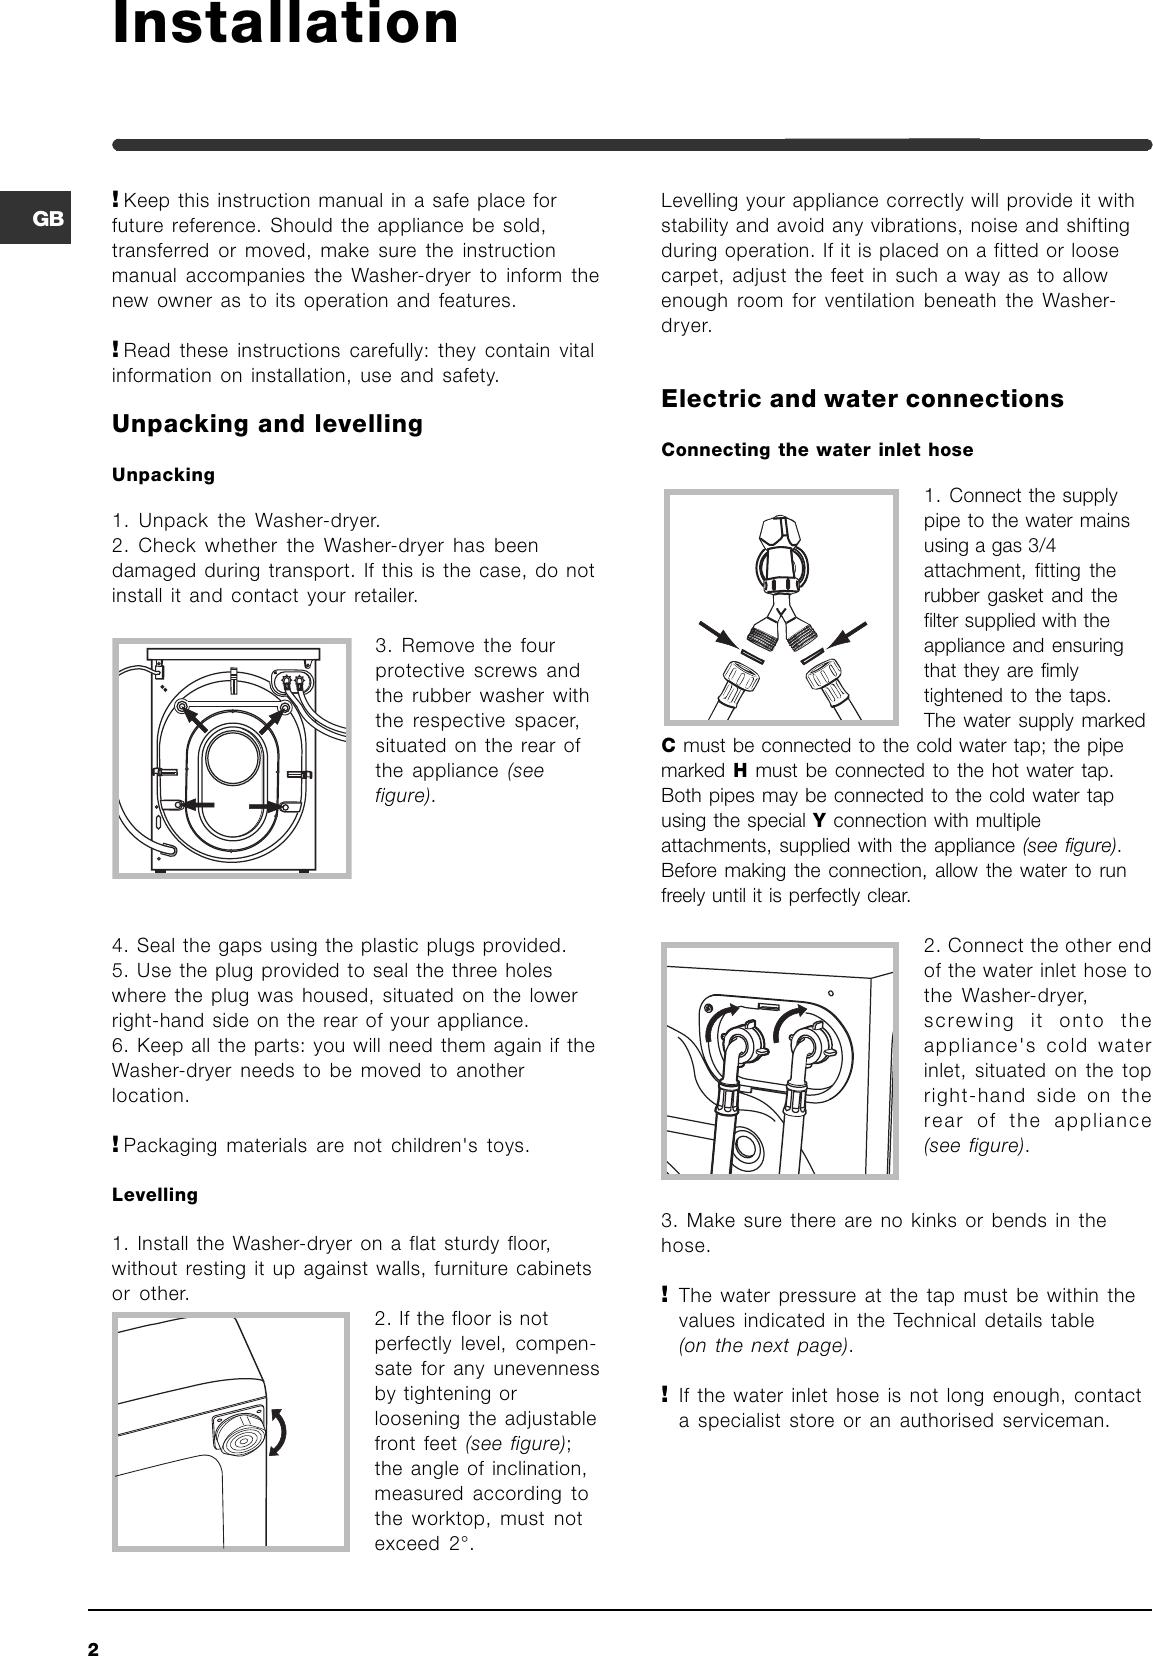 Indesit WIDL 106 Merloni User Manual To The Ca656e21 ec88 4114 ...